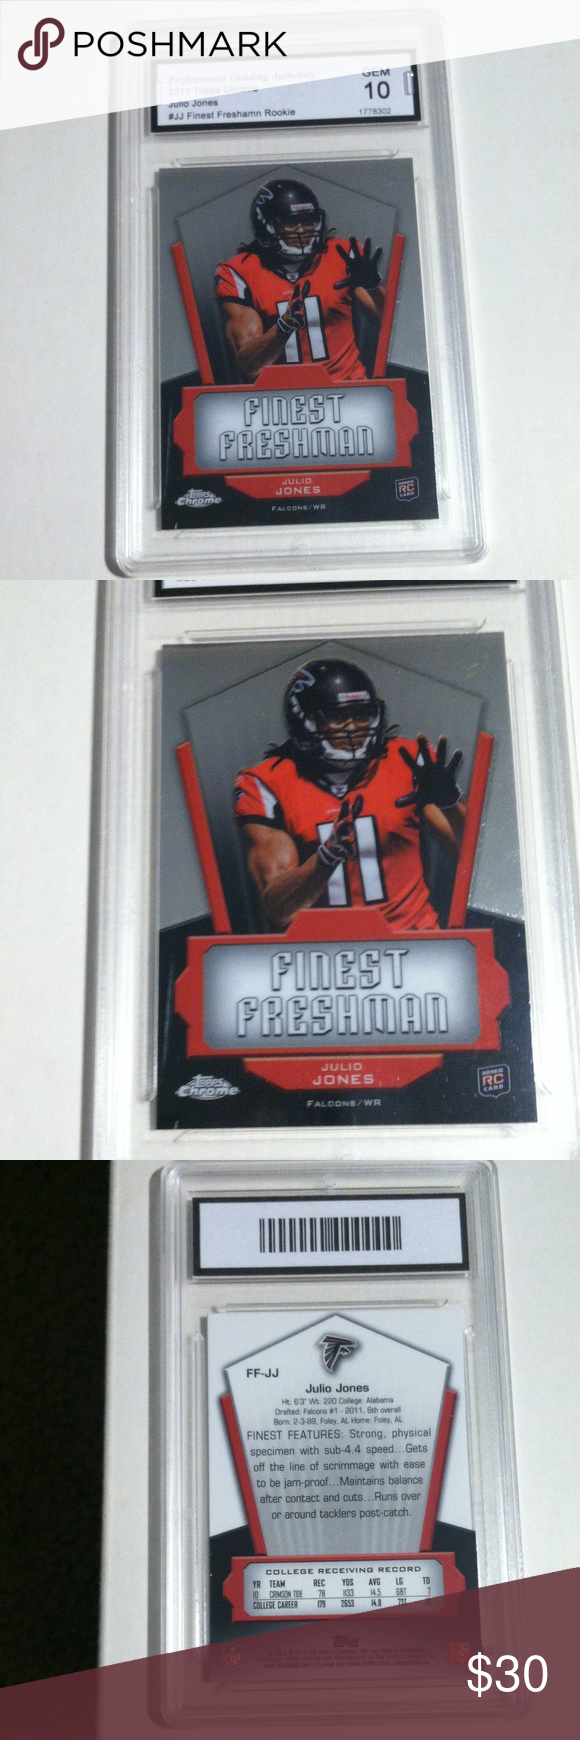 Atlanta Falcons Football Card Julio Jones Rookie Julio Jones 2011 Topps Chrome Finest Freshman Rookie Atlanta Falcons Football Football Cards Falcons Football